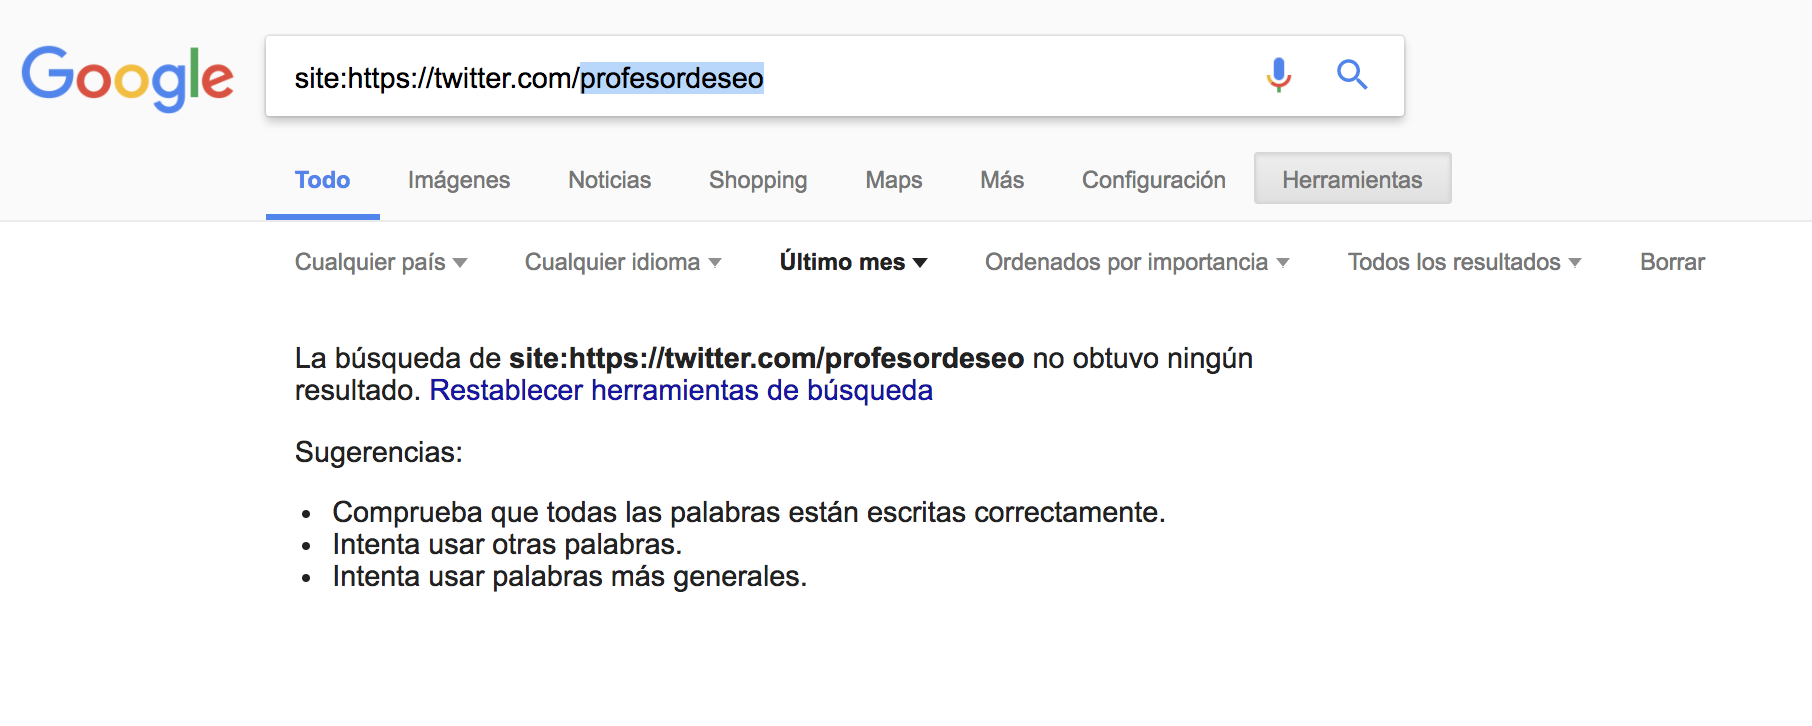 SEO en redes sociales - Twitter @profesordeseo